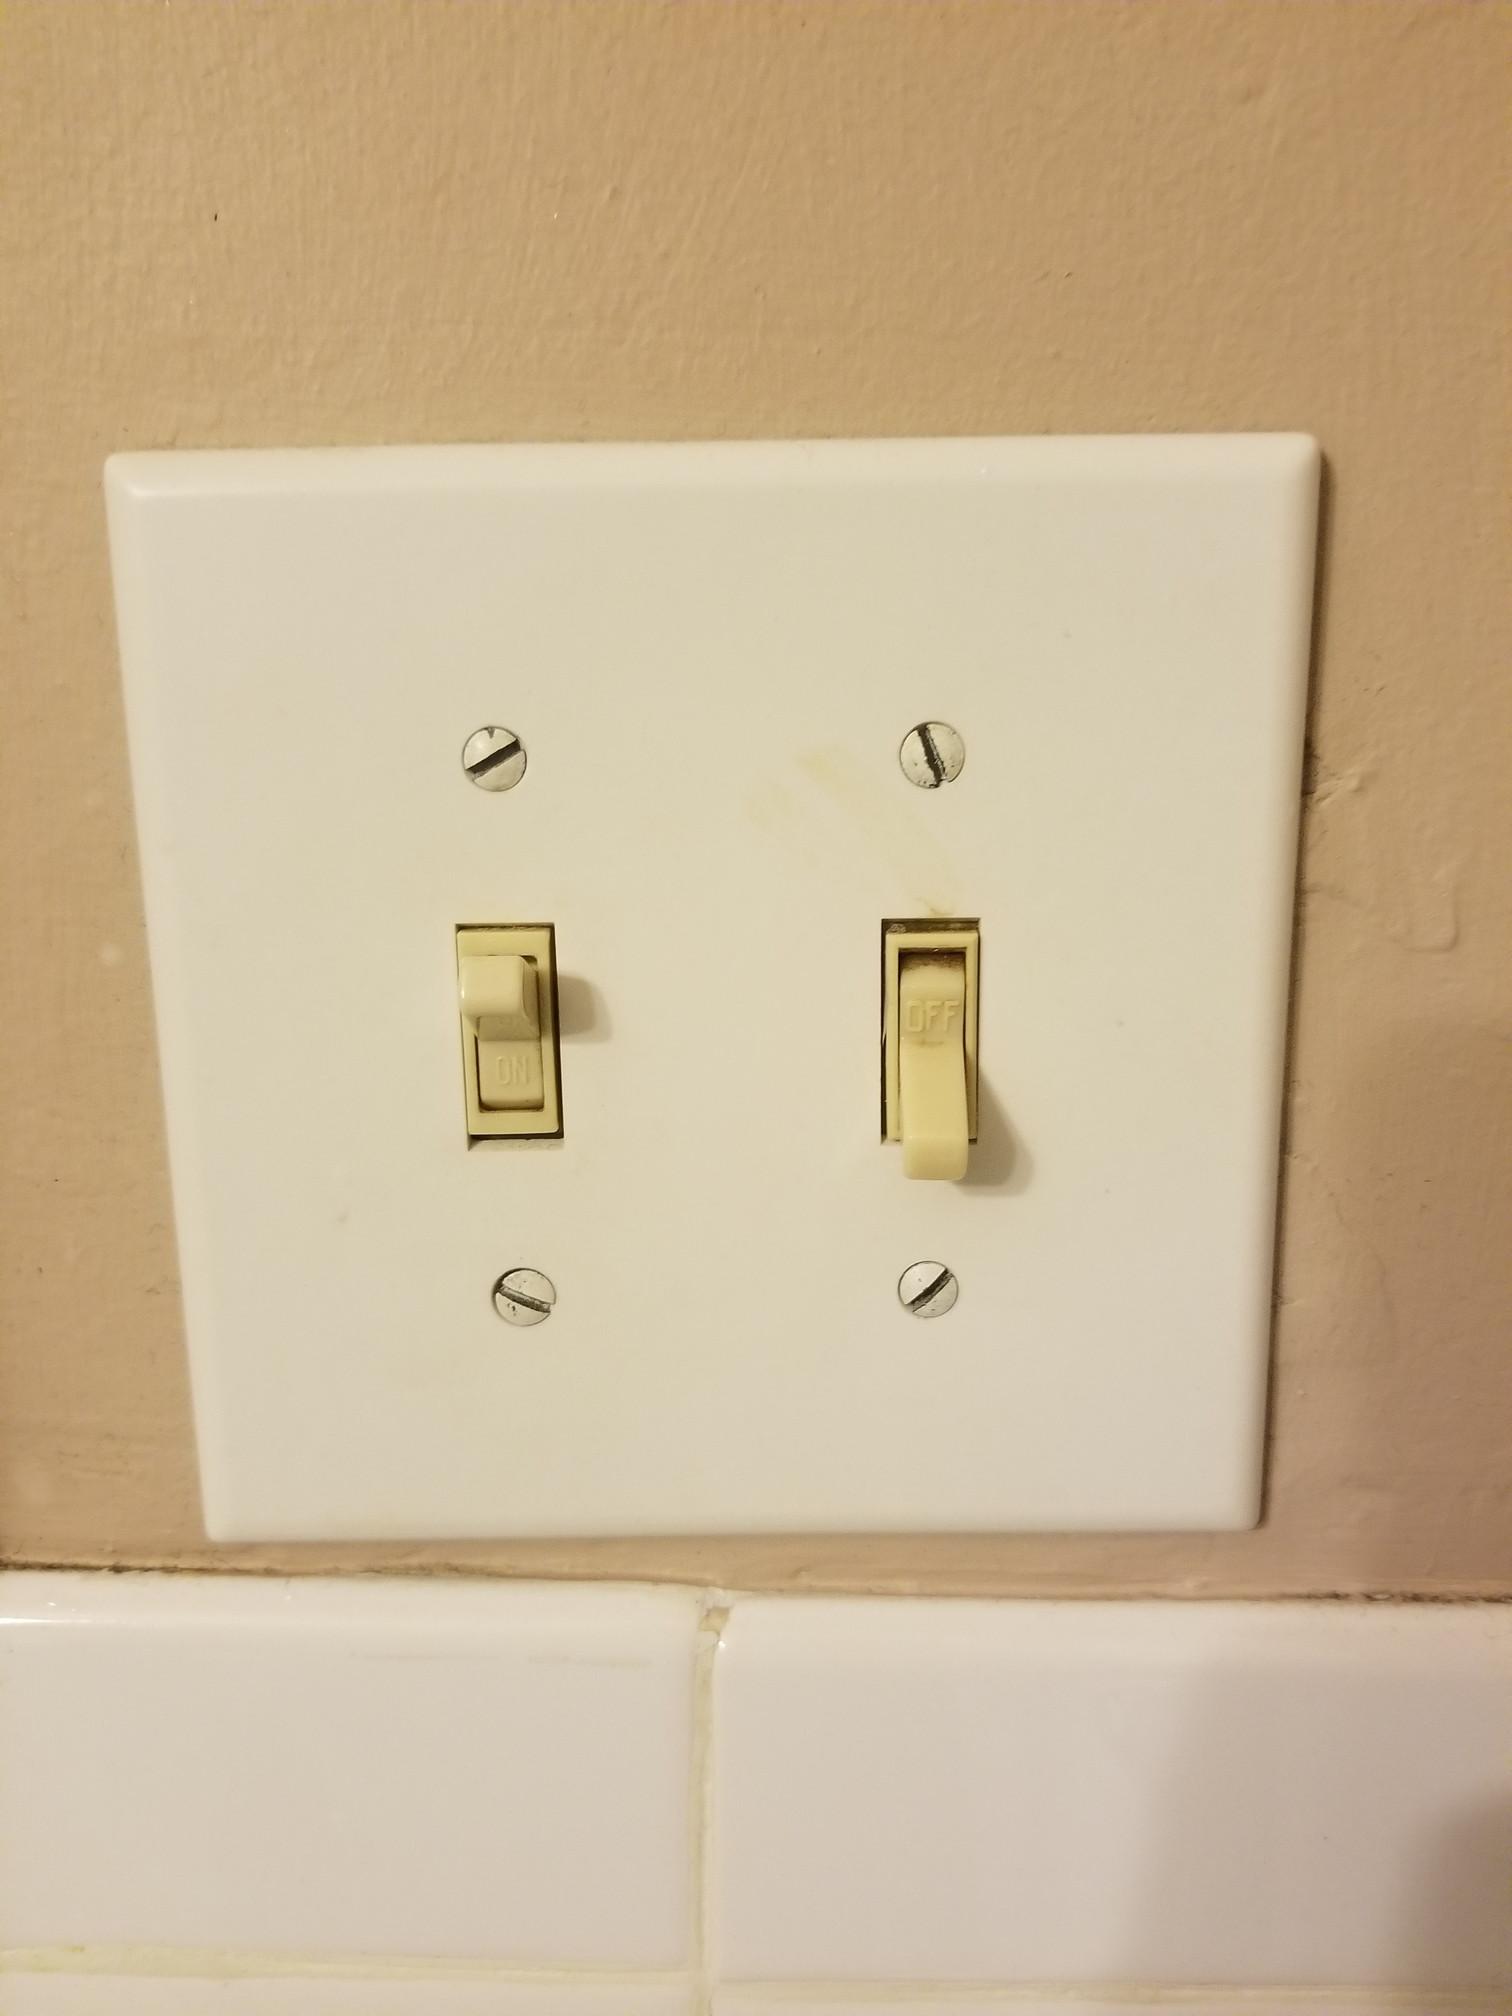 Light Switch Patient Bathroom Hospital